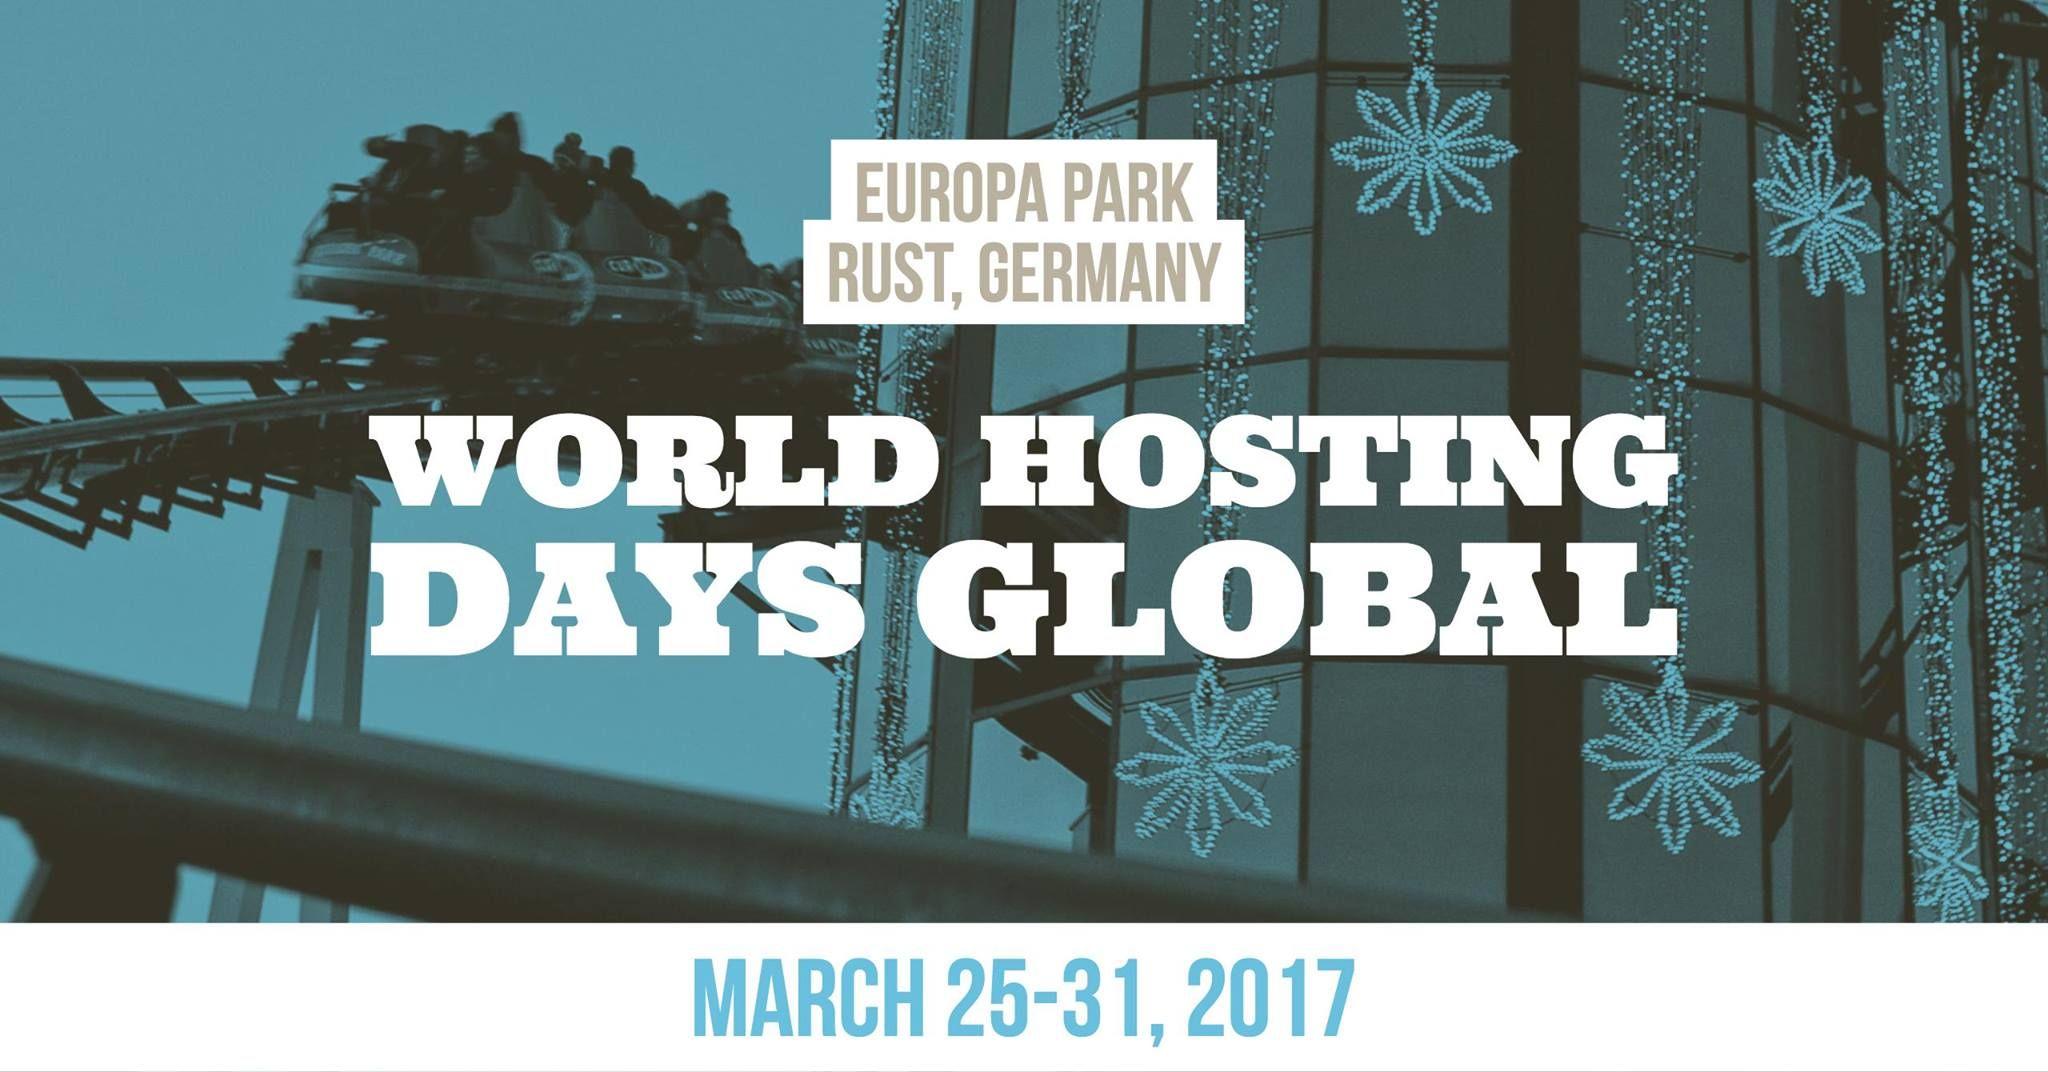 Europapark Rust Facebook